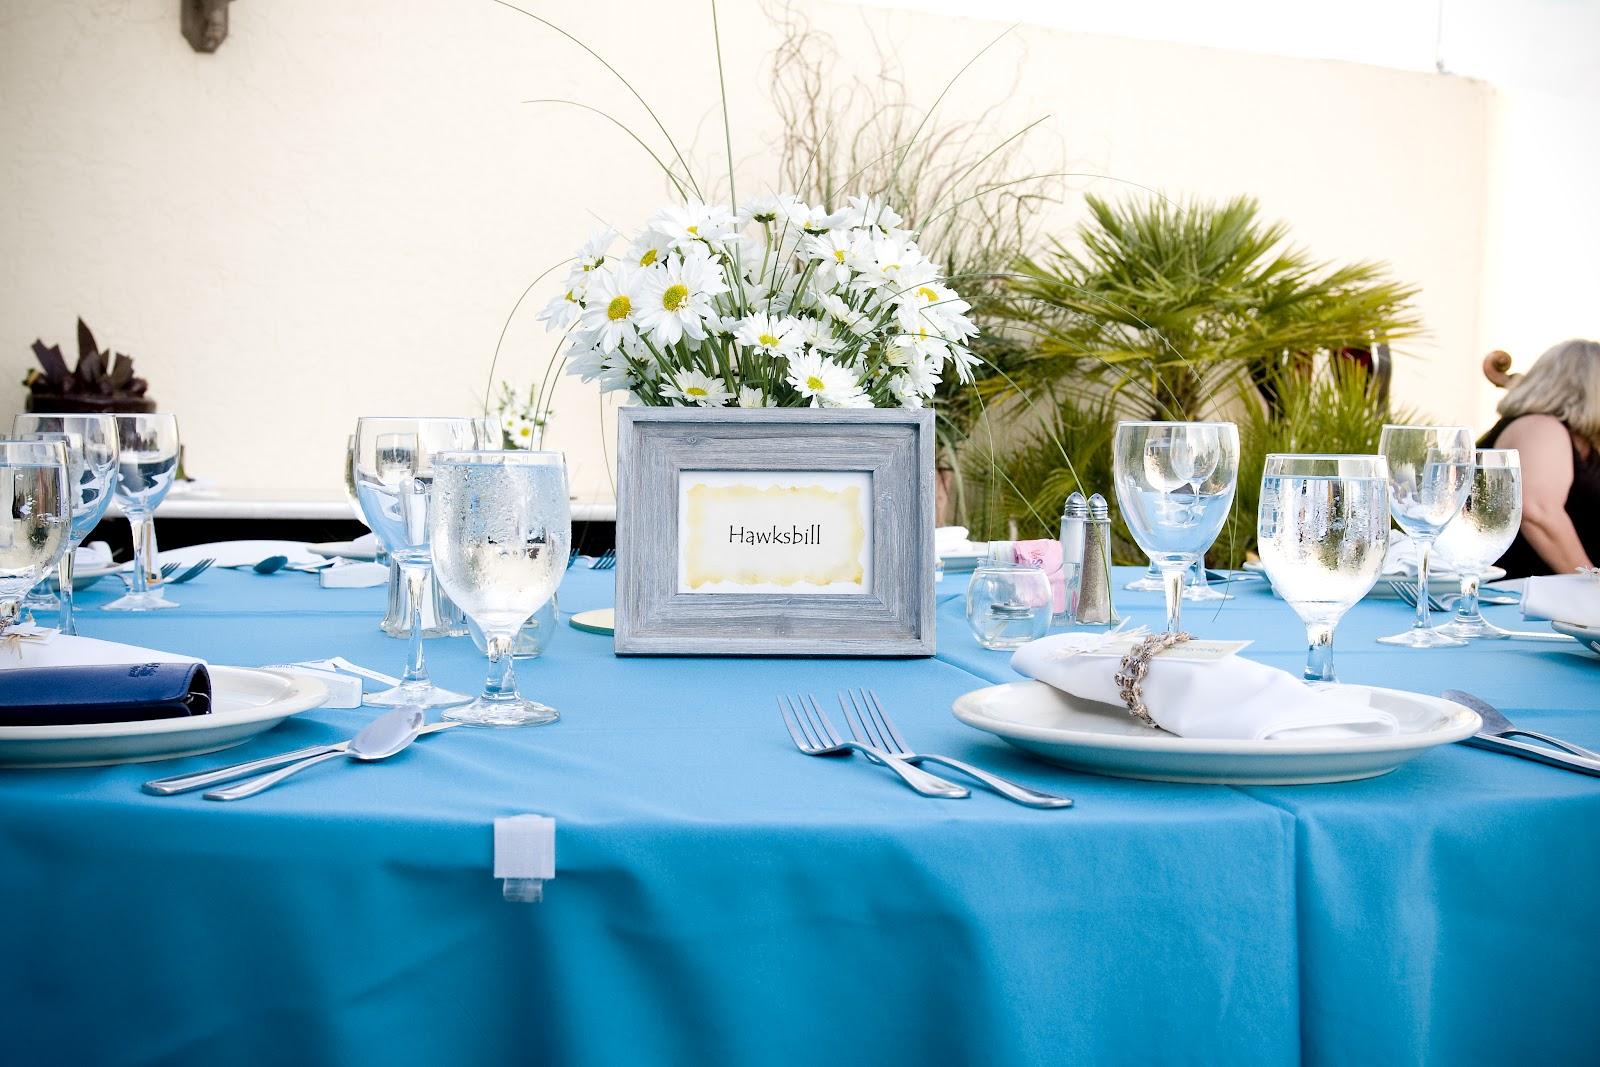 Beach Wedding Table Setting - Daisies RafiaTeal Blue Barn Wood & Susan Snyder: BEACH WEDDING - TABLES